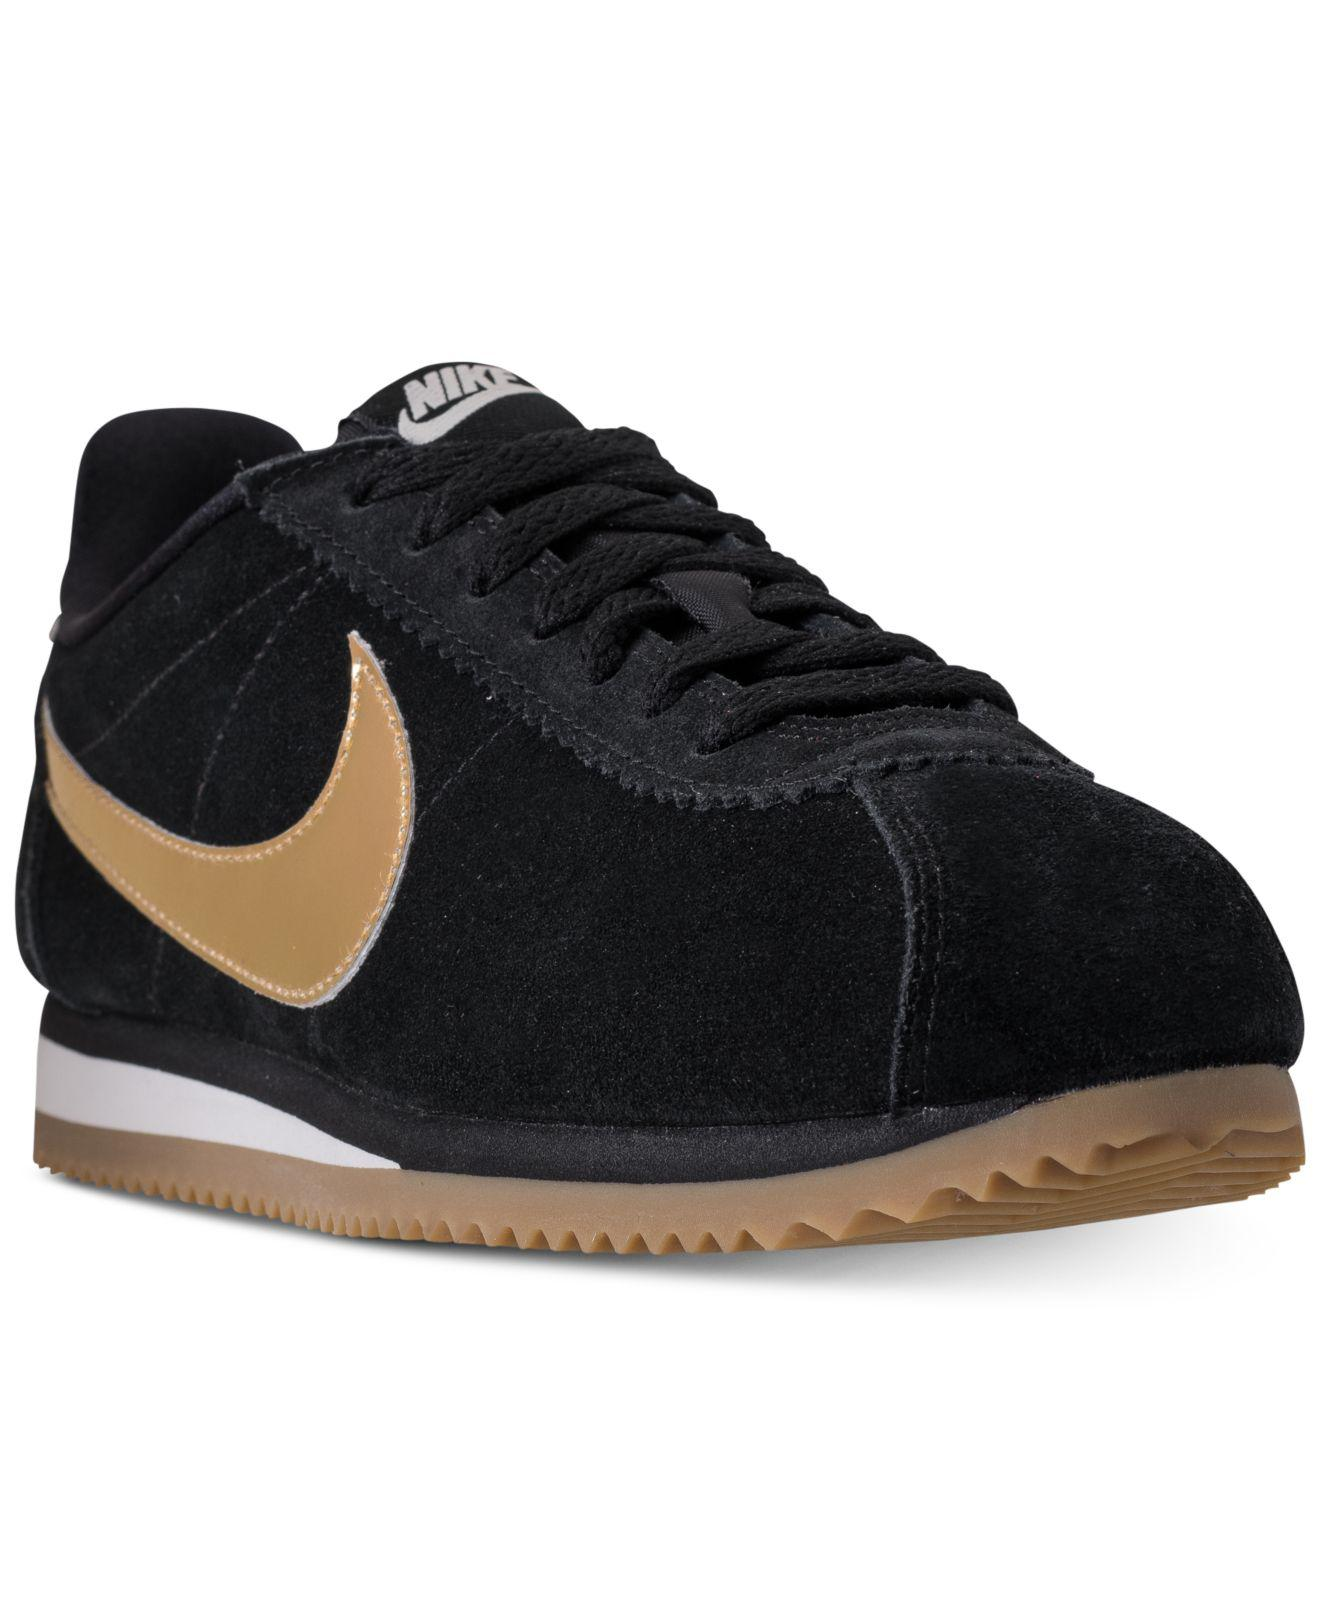 pretty nice 51d9b 58e4f Nike. Women s Black Classic Cortez Se Casual Sneakers From Finish Line